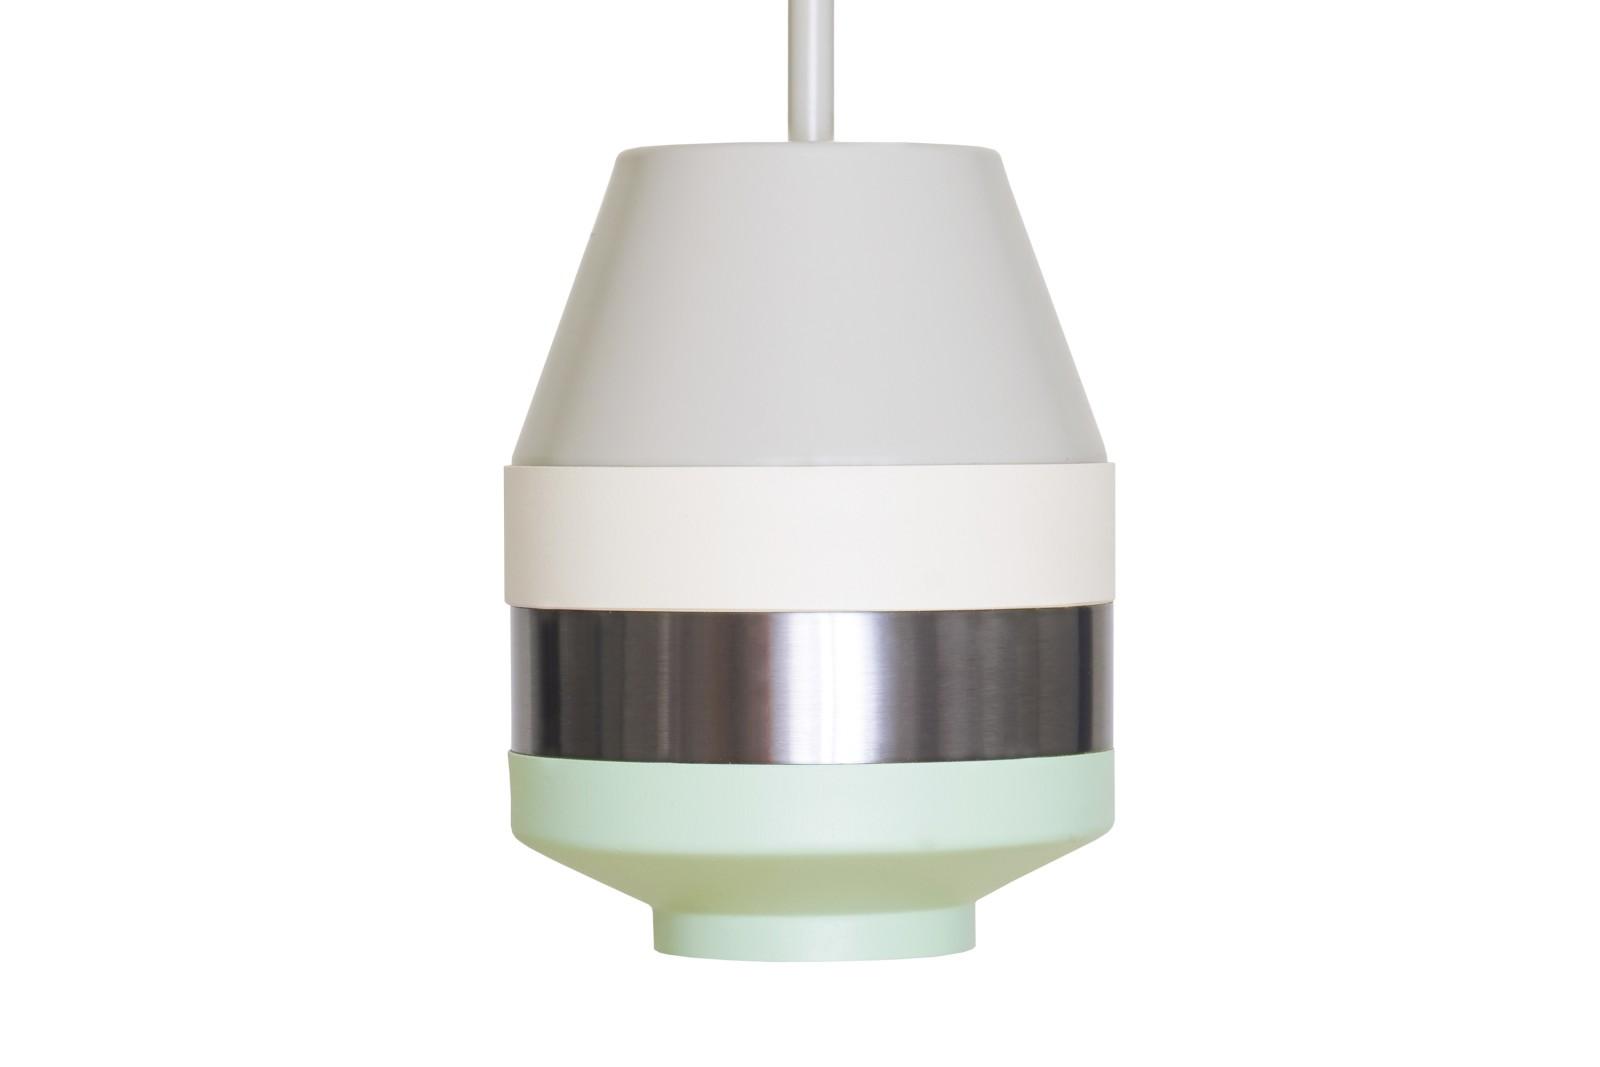 Pran Pendant Light 296 Grey, White, Silver & Copper